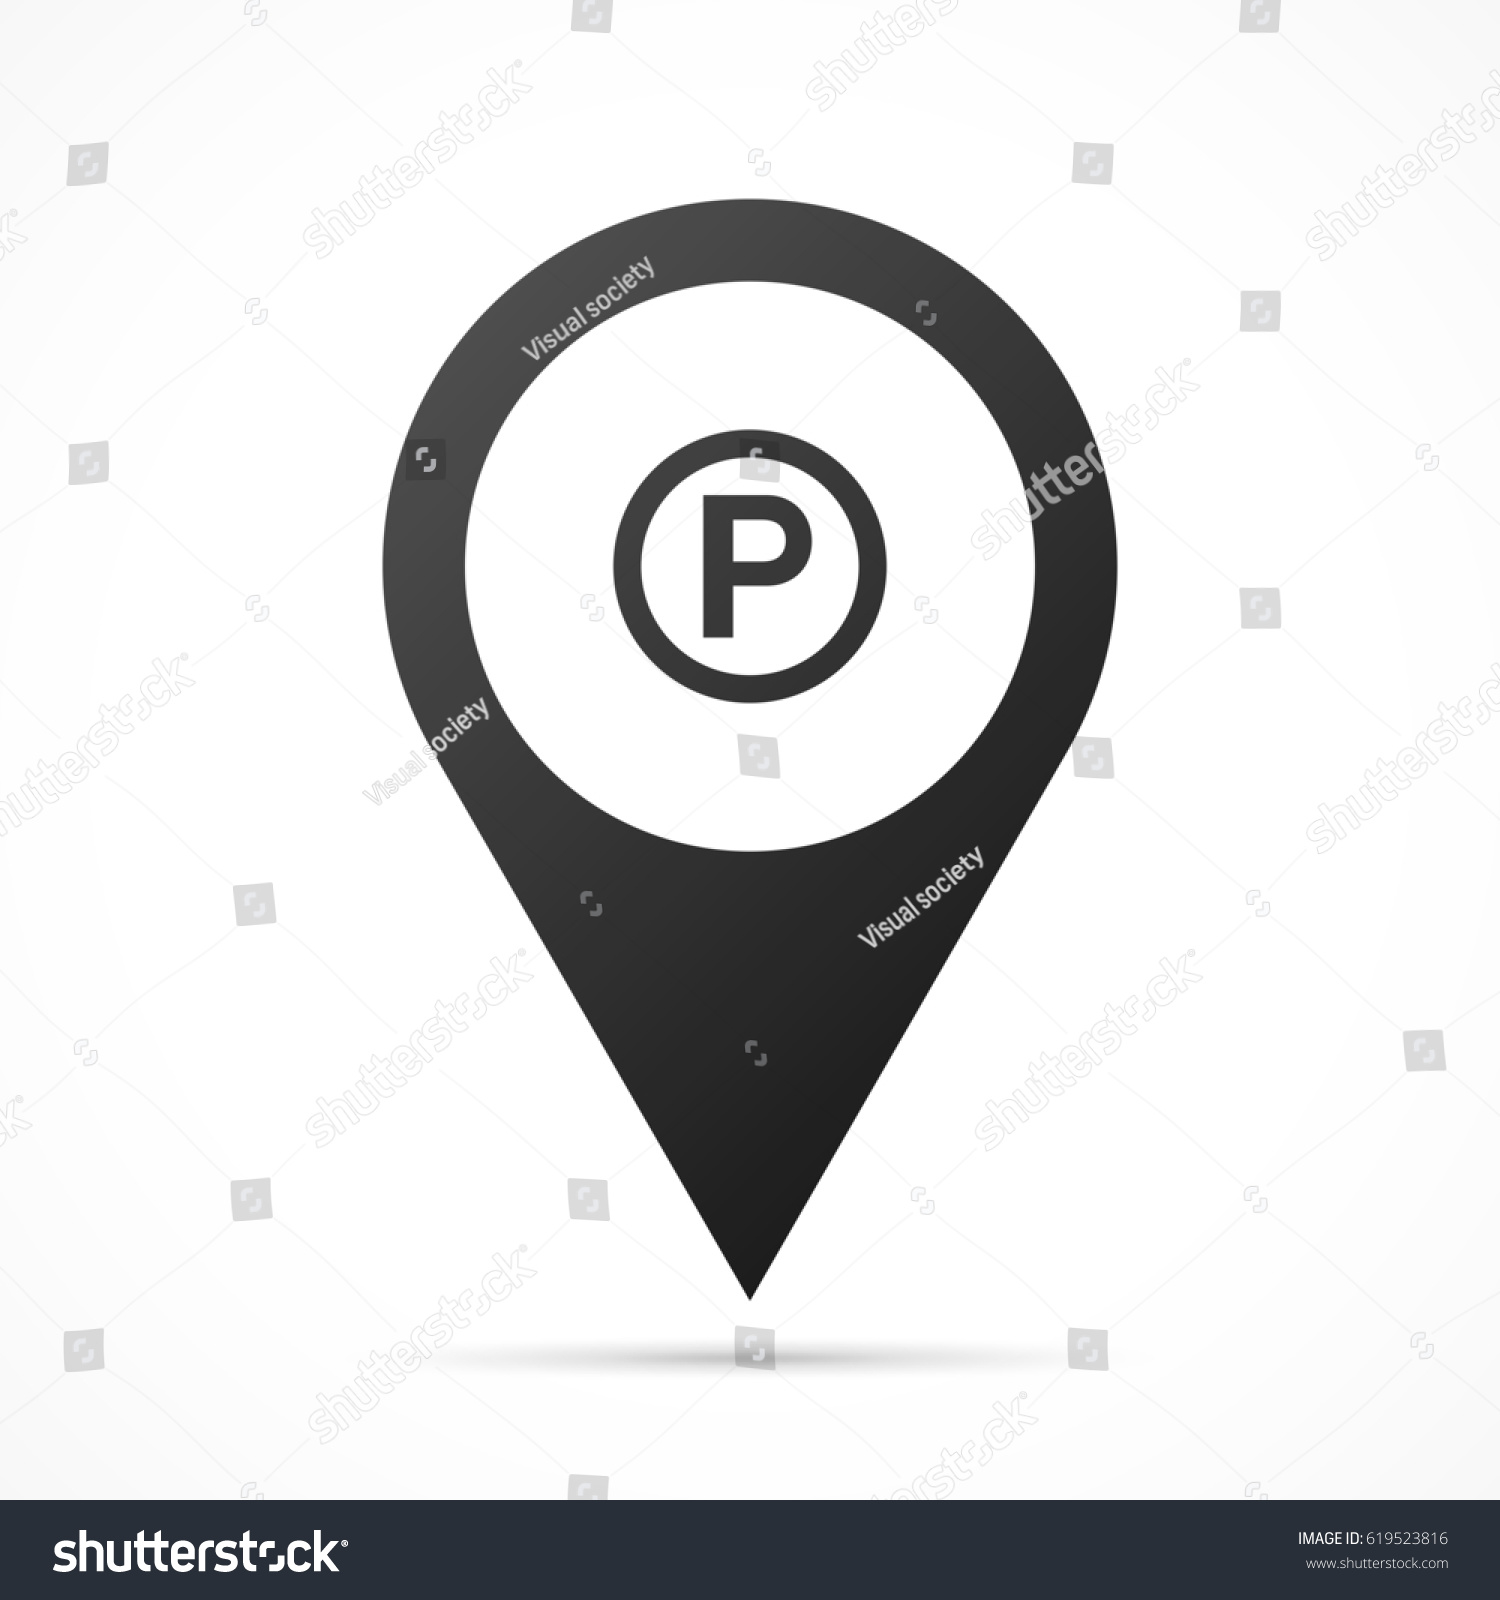 P Sound Recording Copyright Symbol On Map Pin Location Pointer